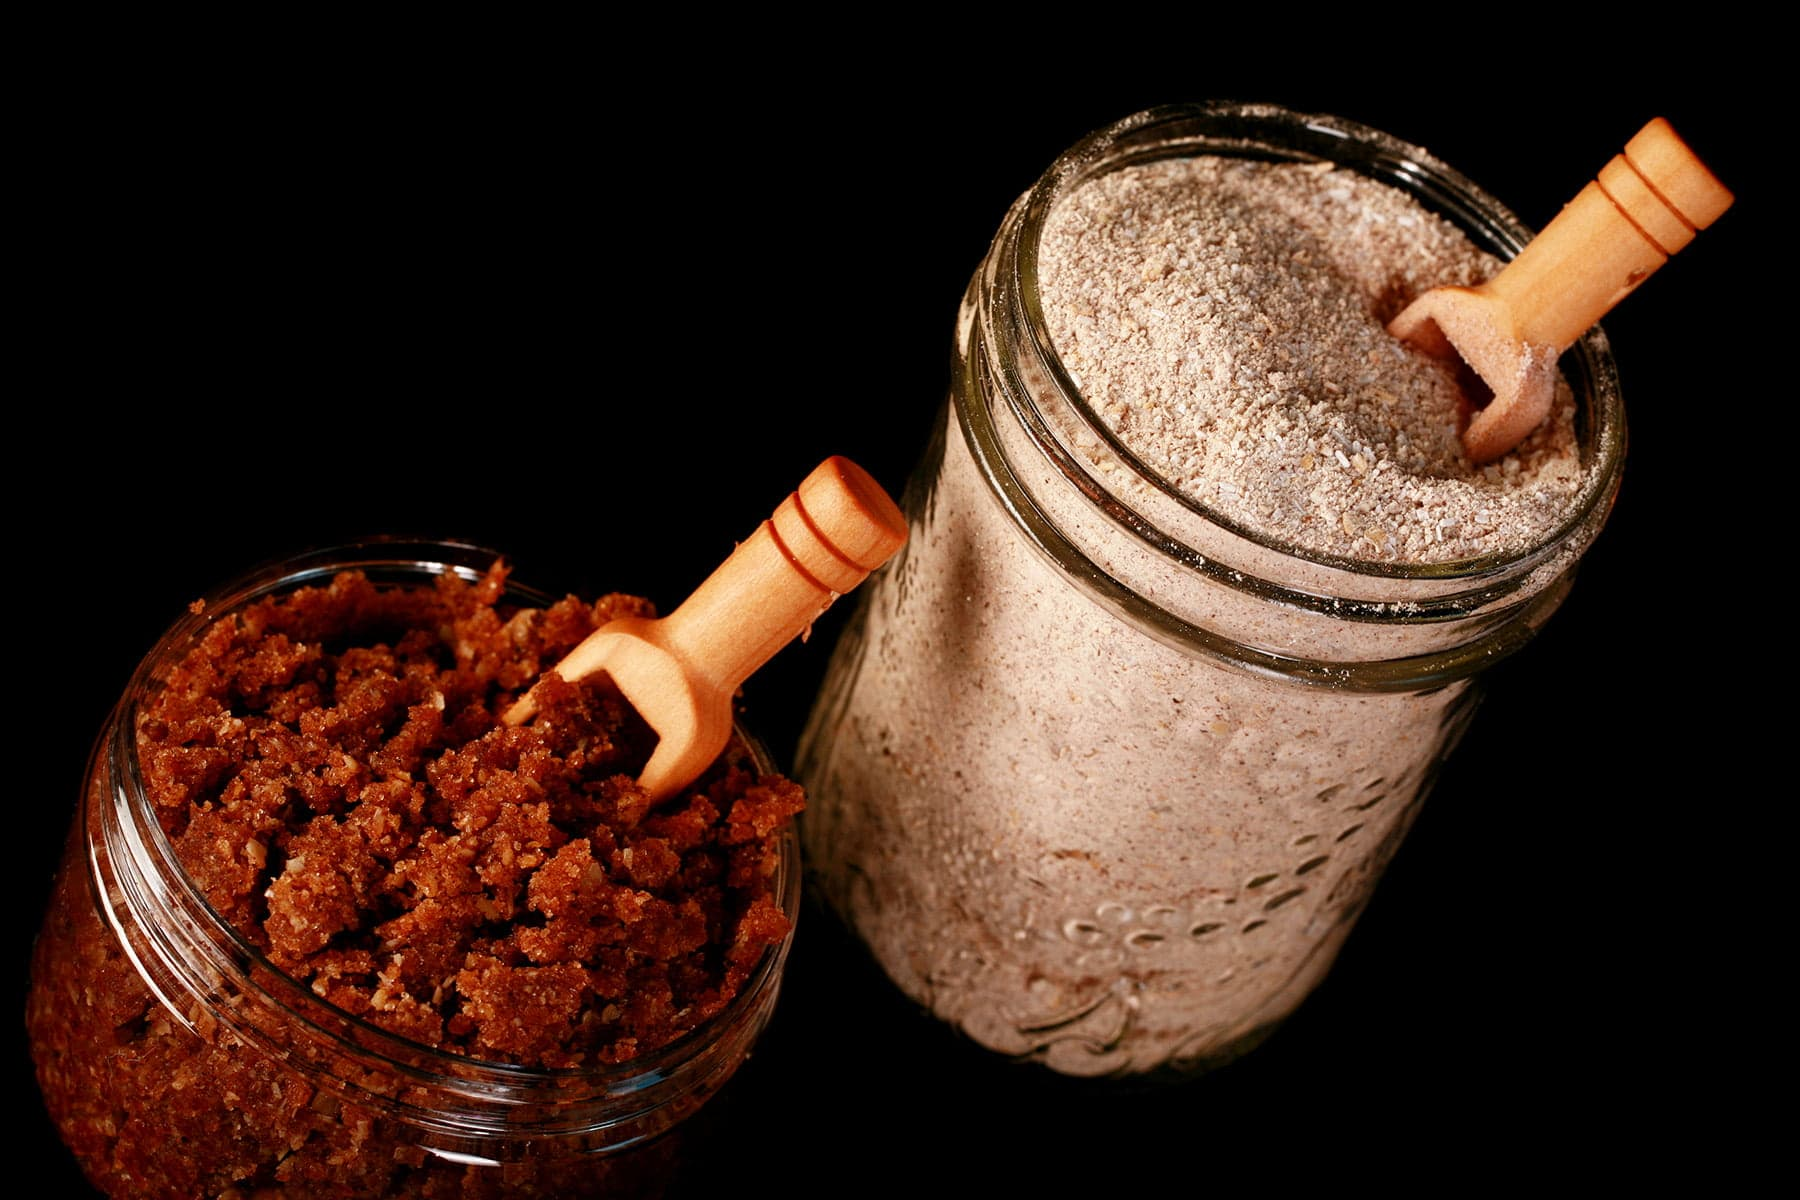 A two piece bath set pictured against a black background. A Mason jar contains an ivory coloured Oatmeal Milk Bath powder, and a smaller jar contains a rich brown Oatmeal Sugar Scrub